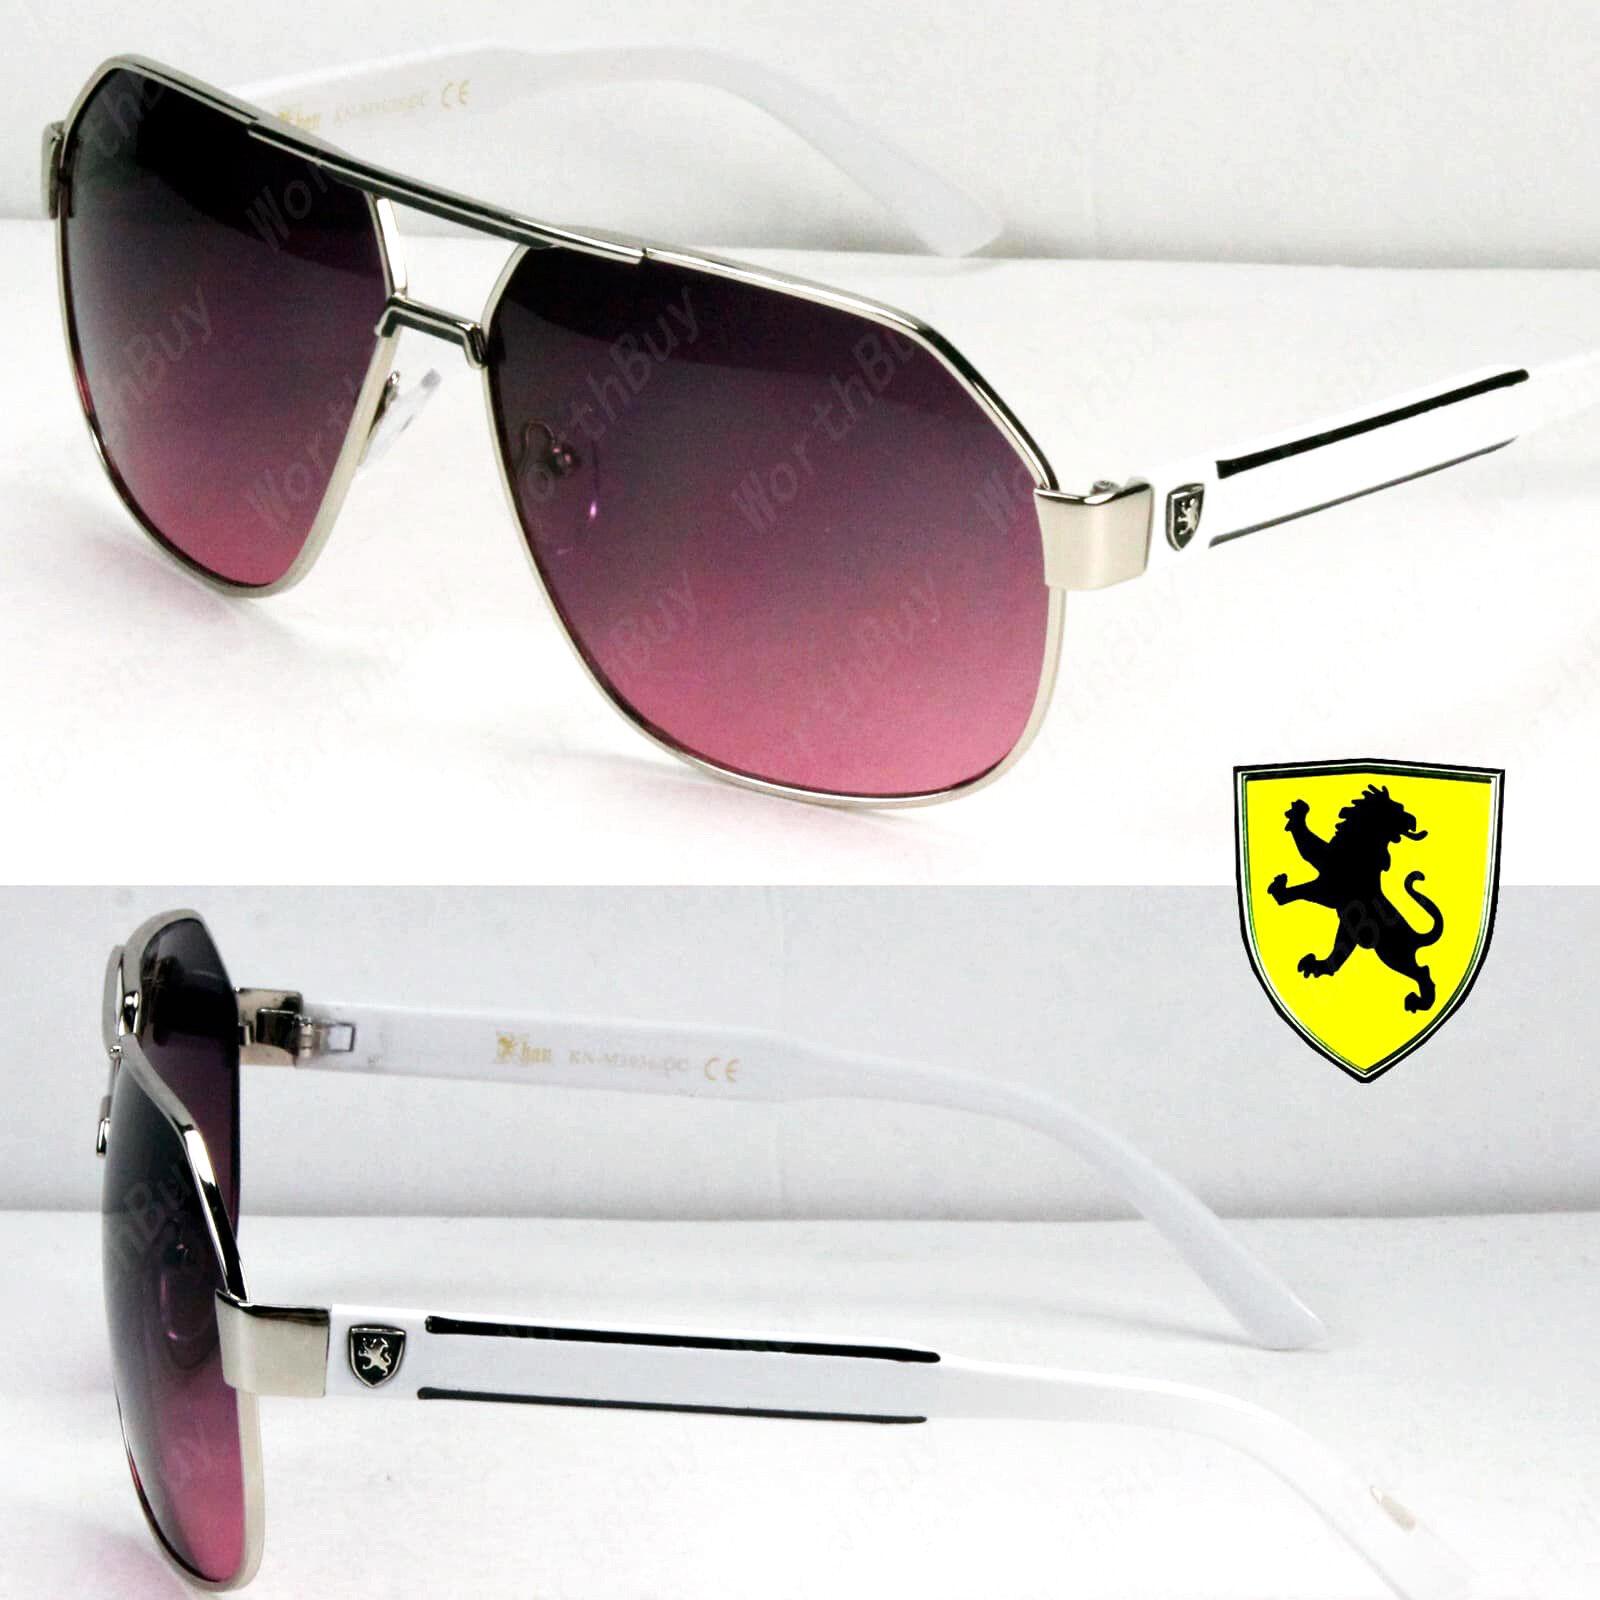 737ca690b793 New Khan Mens Womens Designer Fashion Sunglasses Shades Metal Pilot Retro  Lion